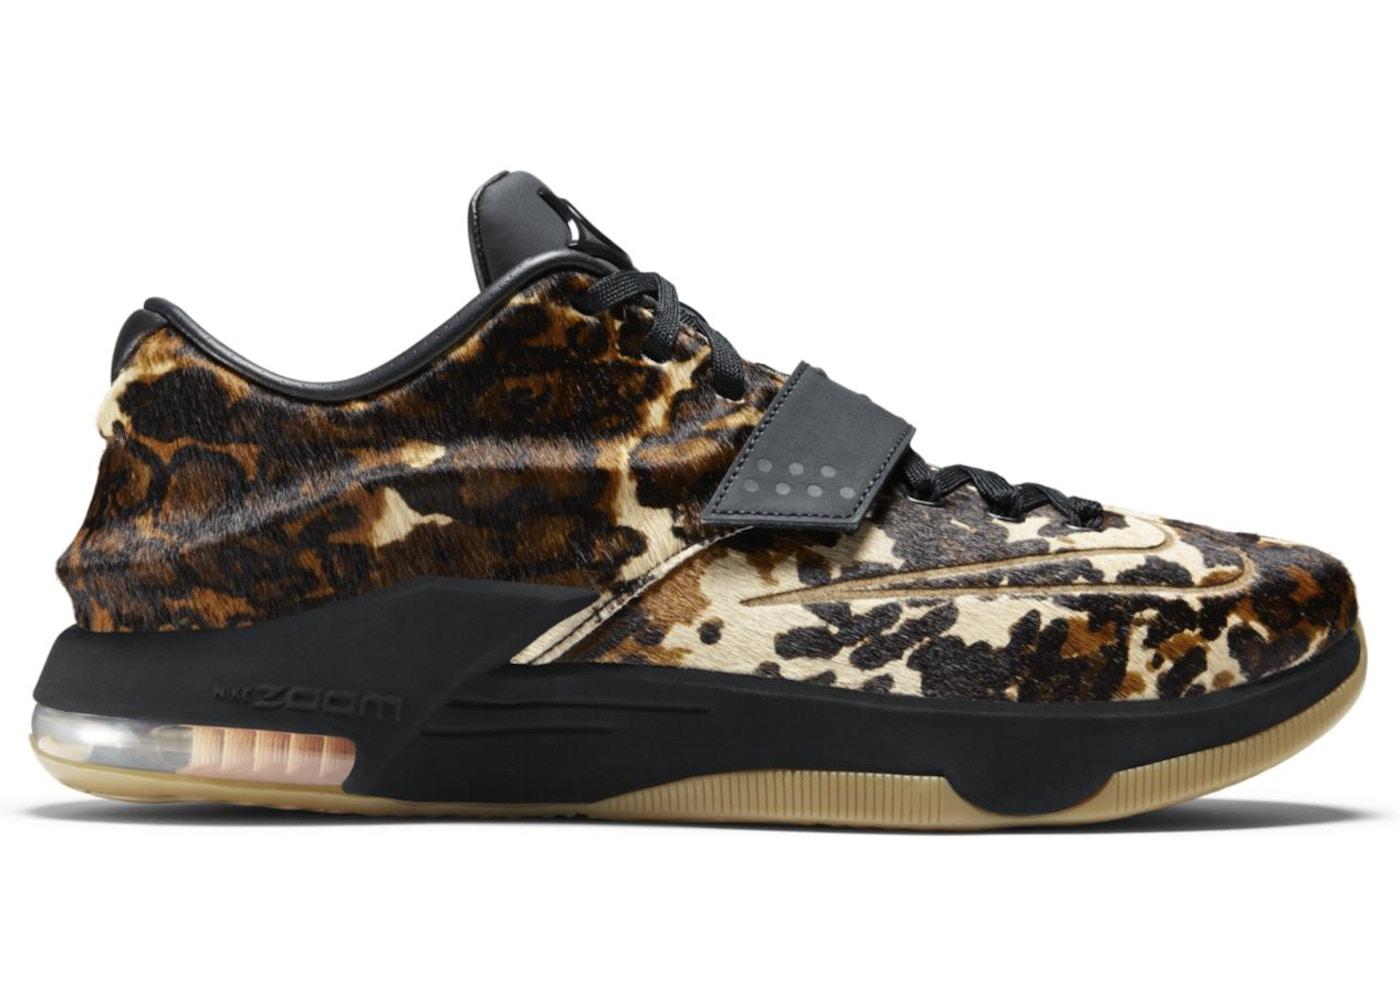 3c68411b0b5f Nike KD 7 Shoes - Release Date